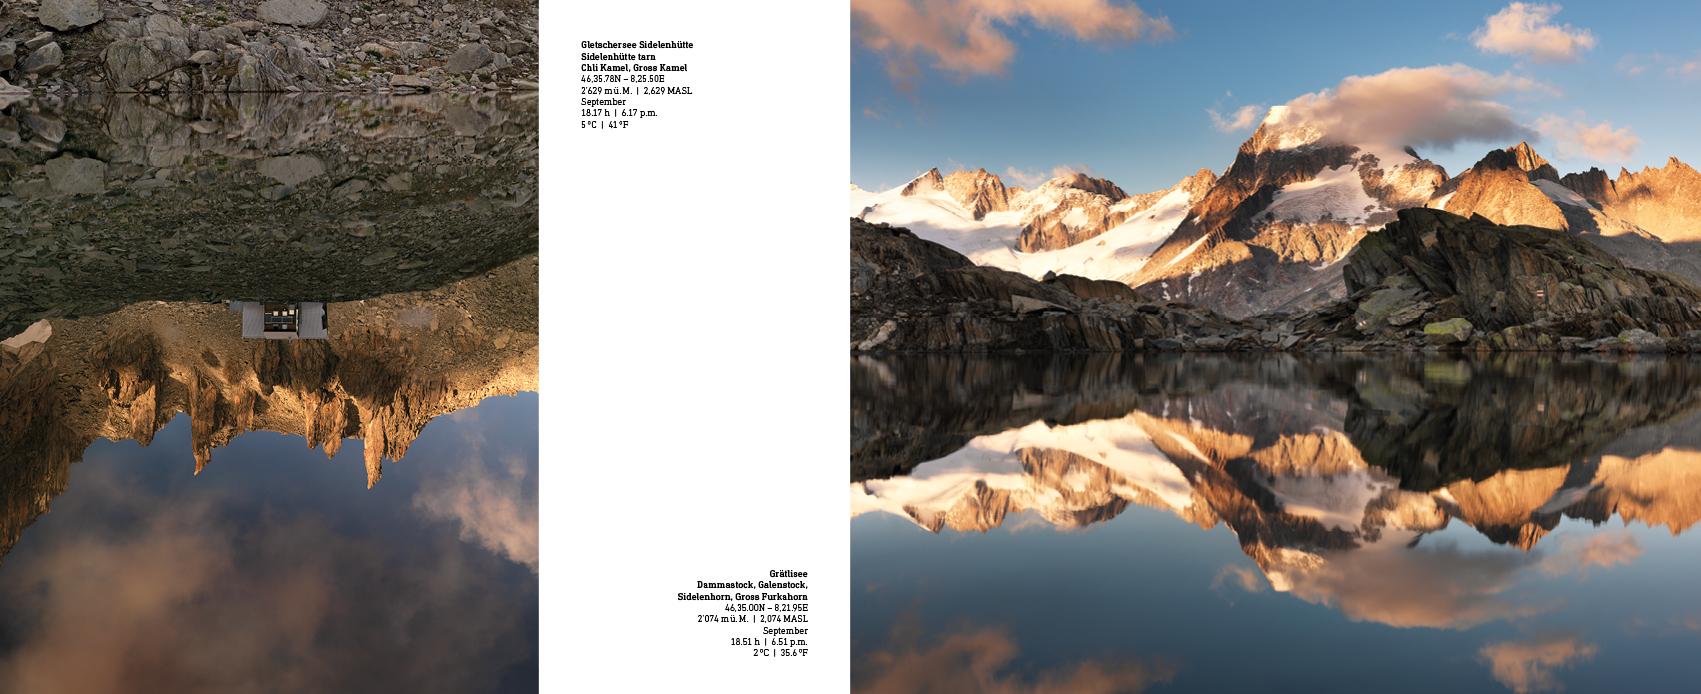 Seite 52-53